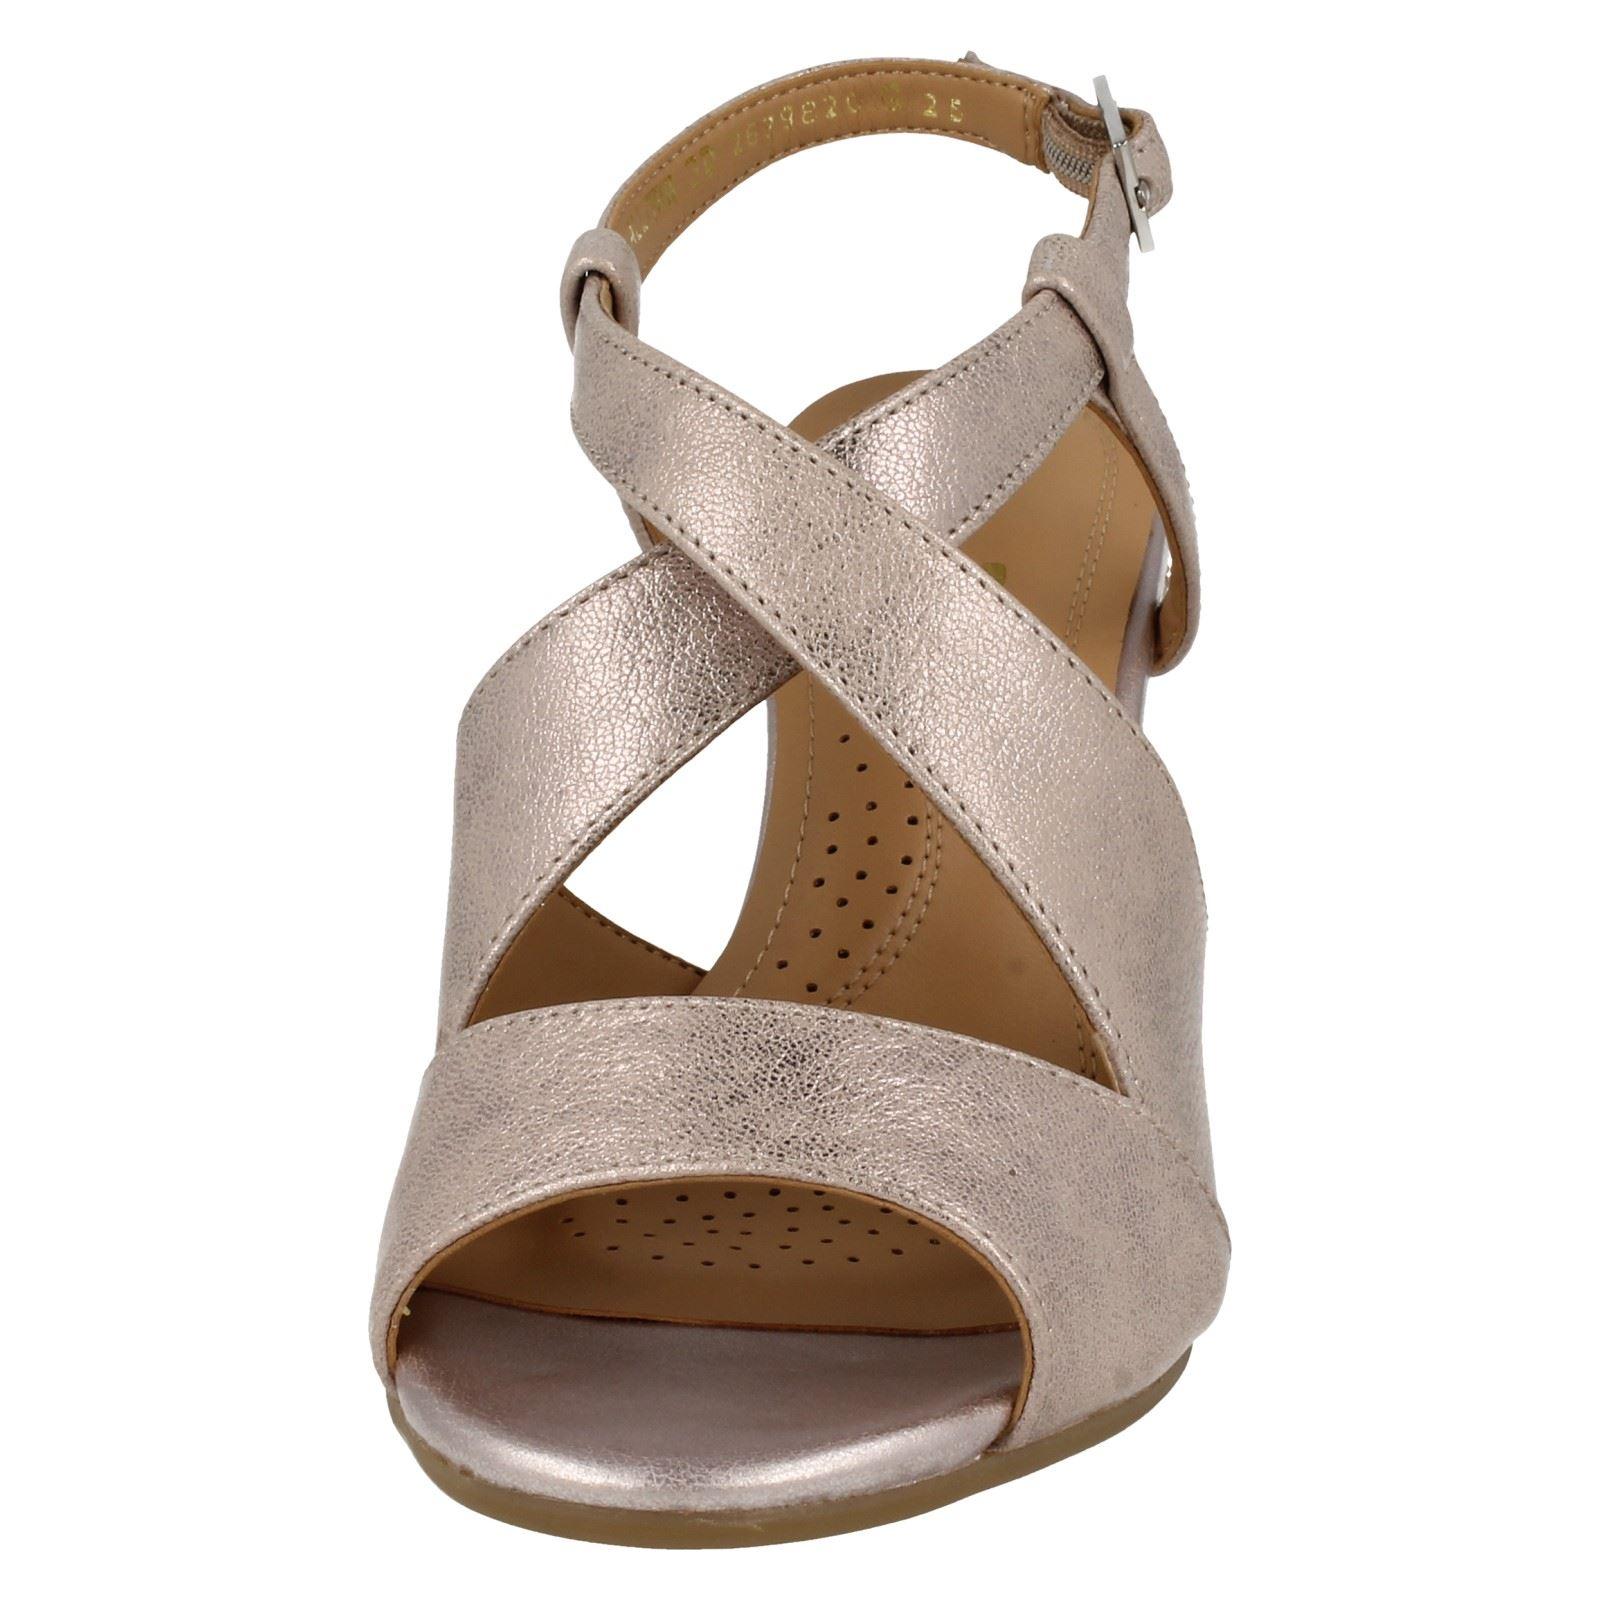 Ladies-Van-Dal-Cross-Strap-Wedged-Sandal-Allora thumbnail 6